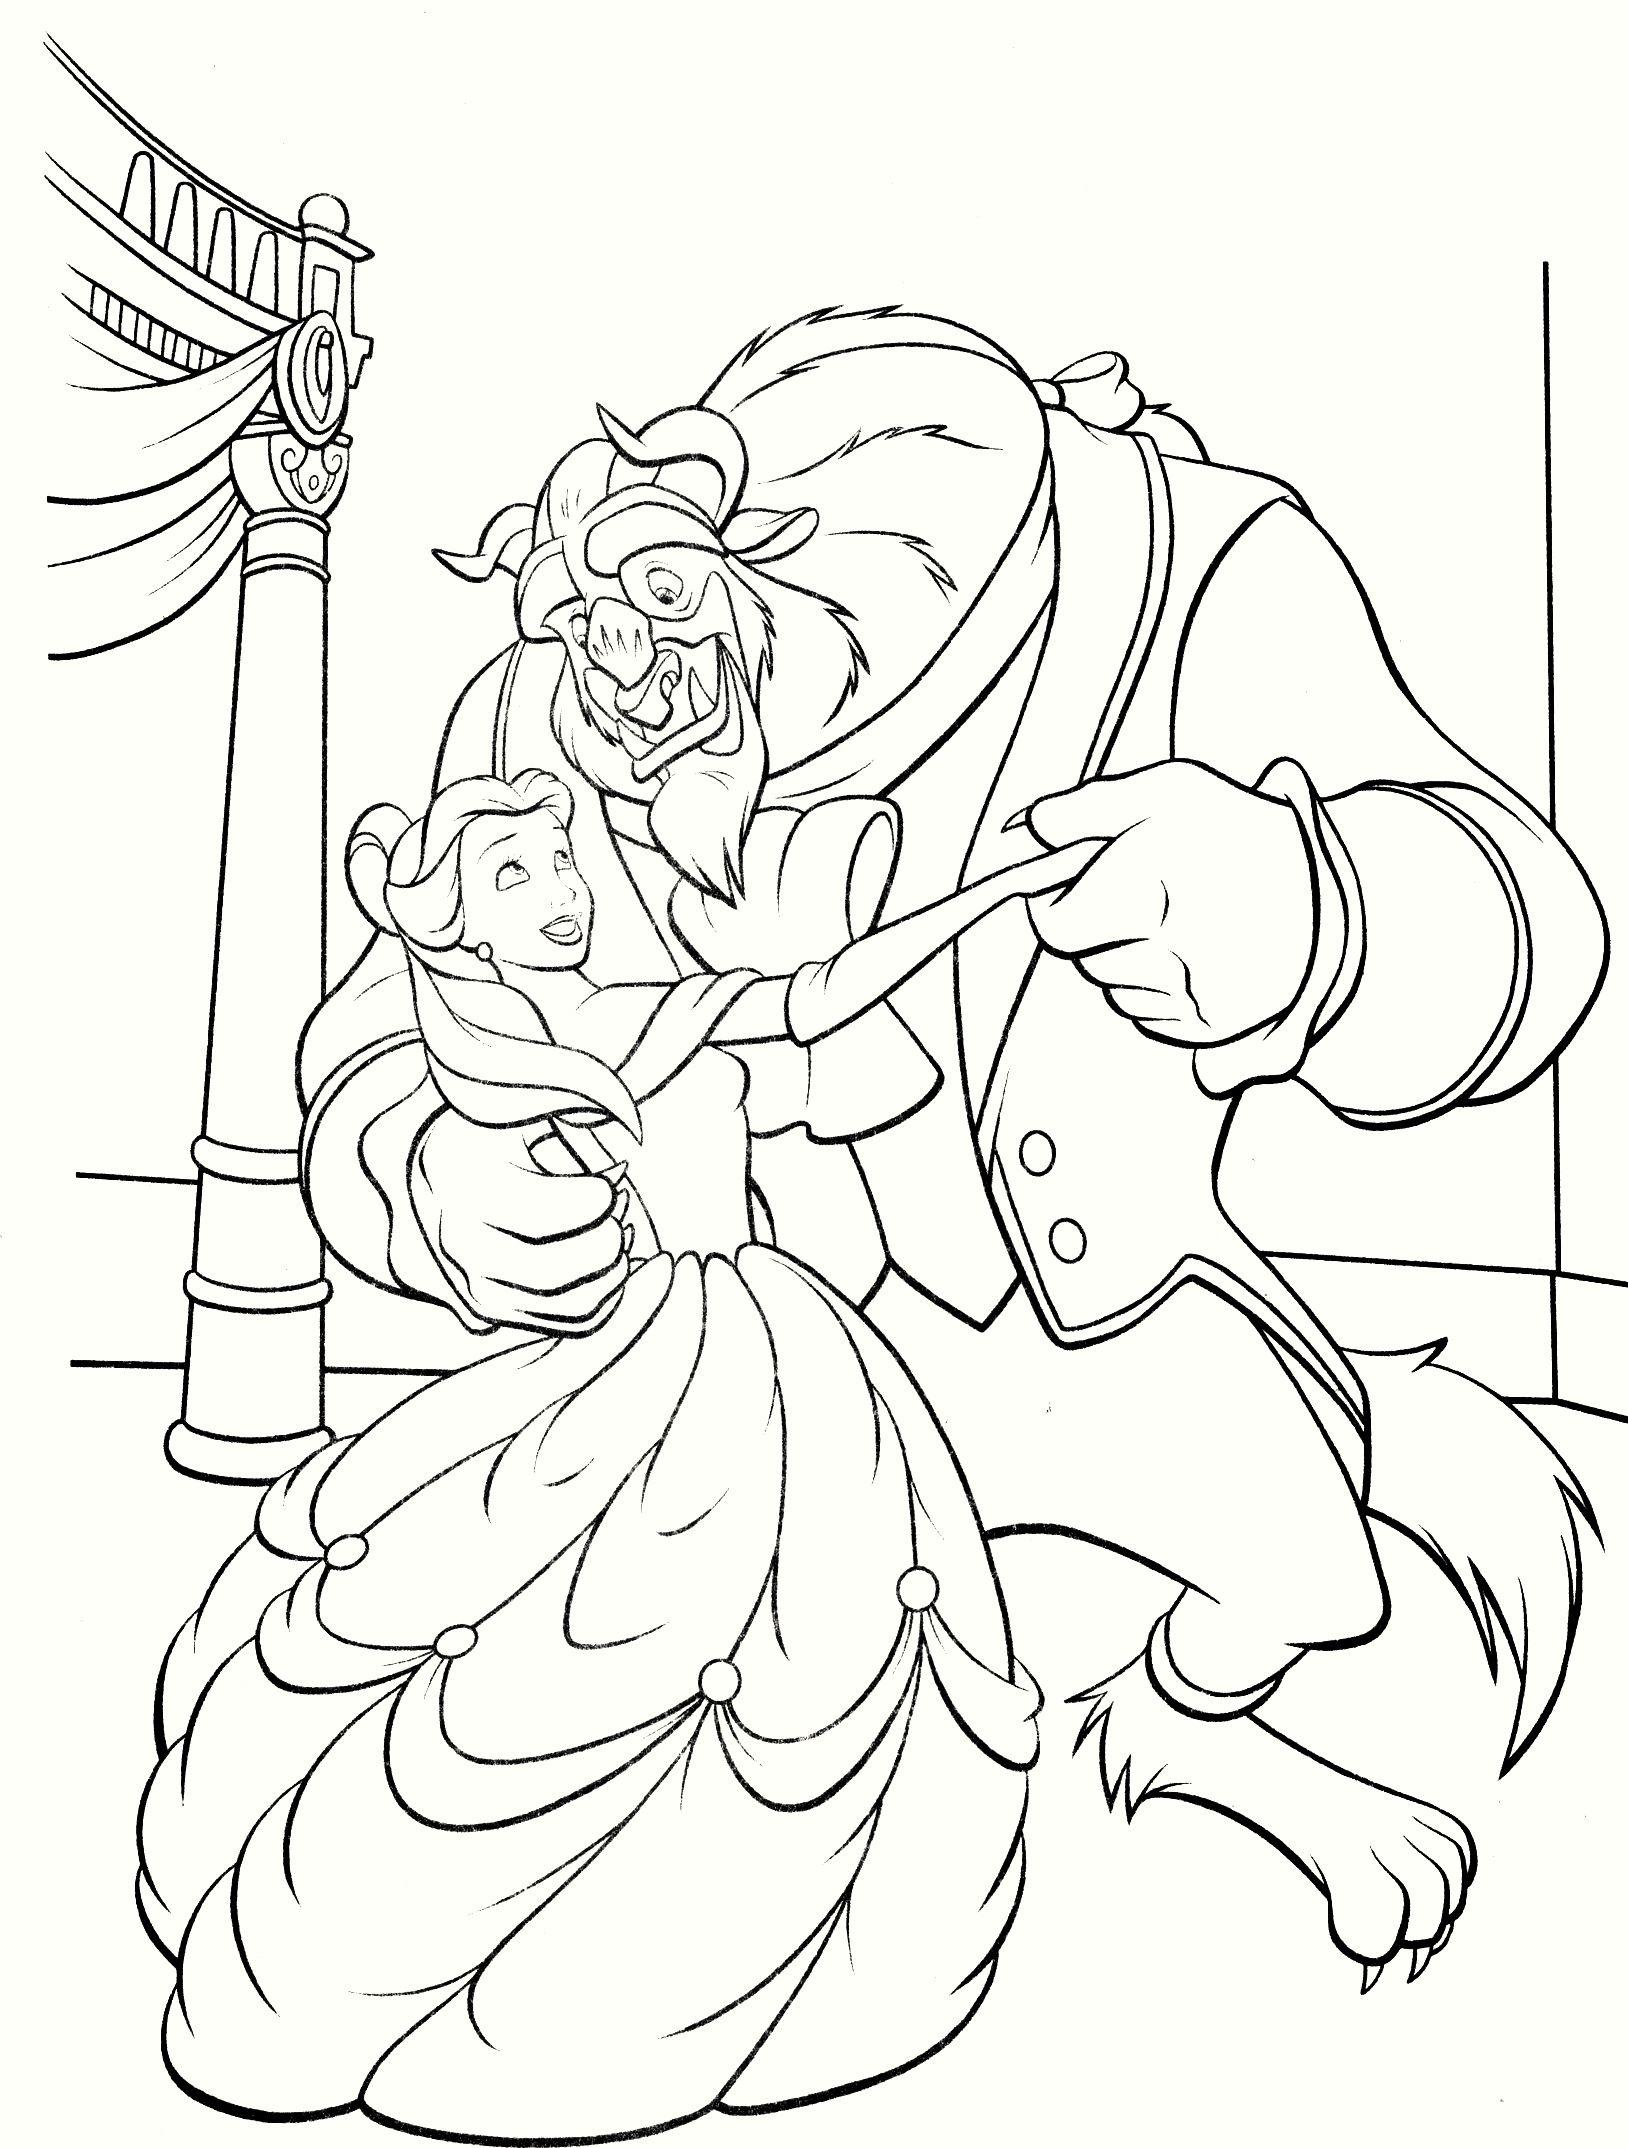 Pin de Karen Ho en 15 Beauty and The Beast Coloring Pages   Pinterest